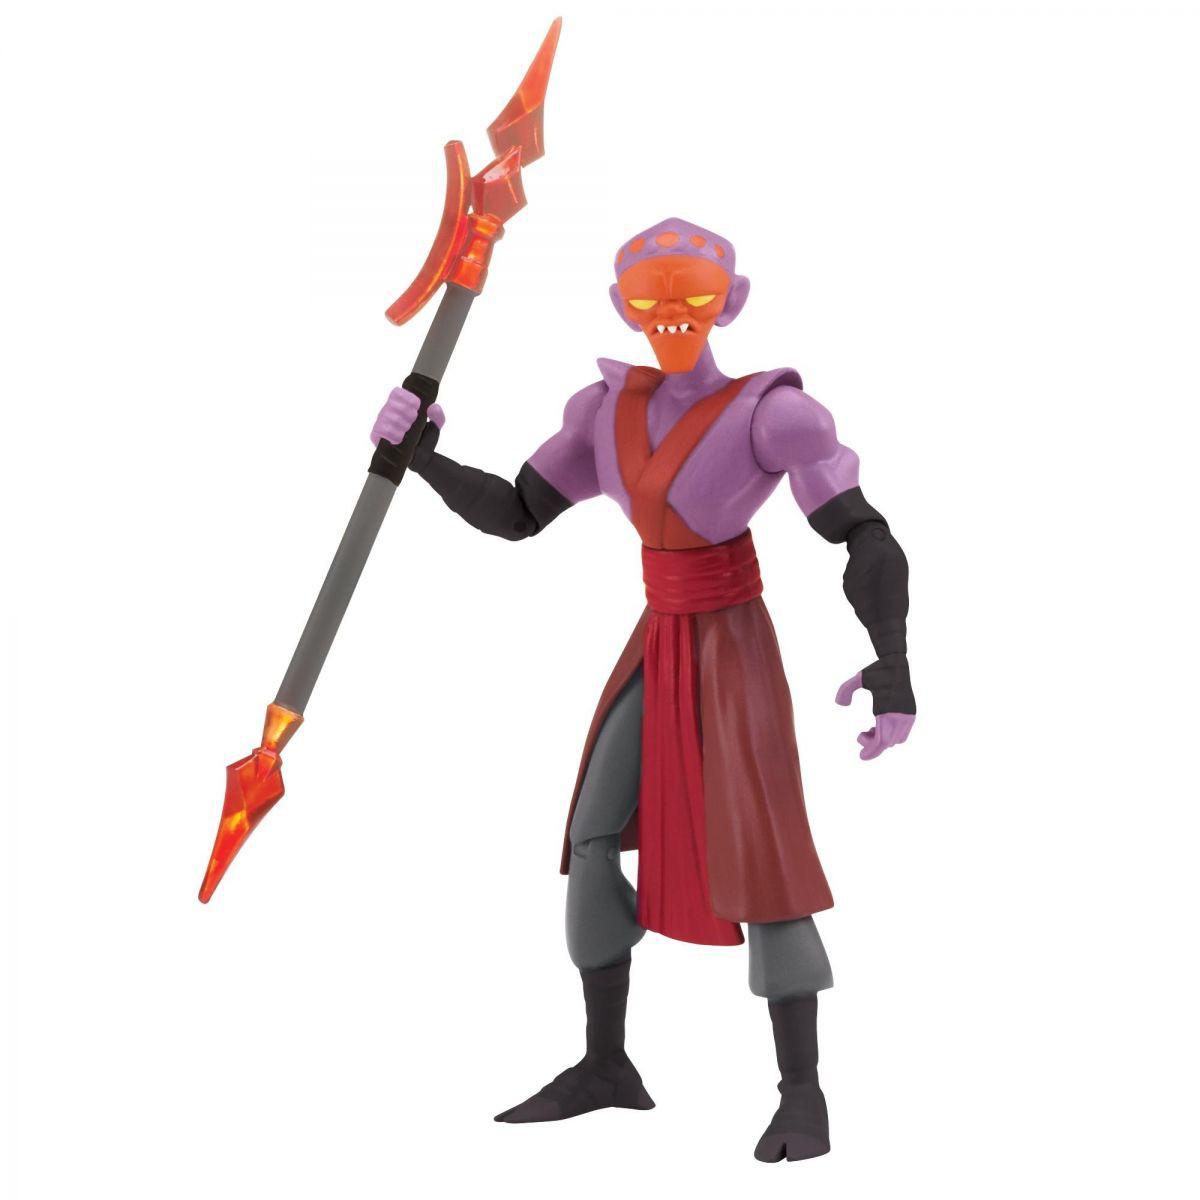 Figura De Açao As Tartarugas Ninjas Foot Lieutenant 2040 - Sunny